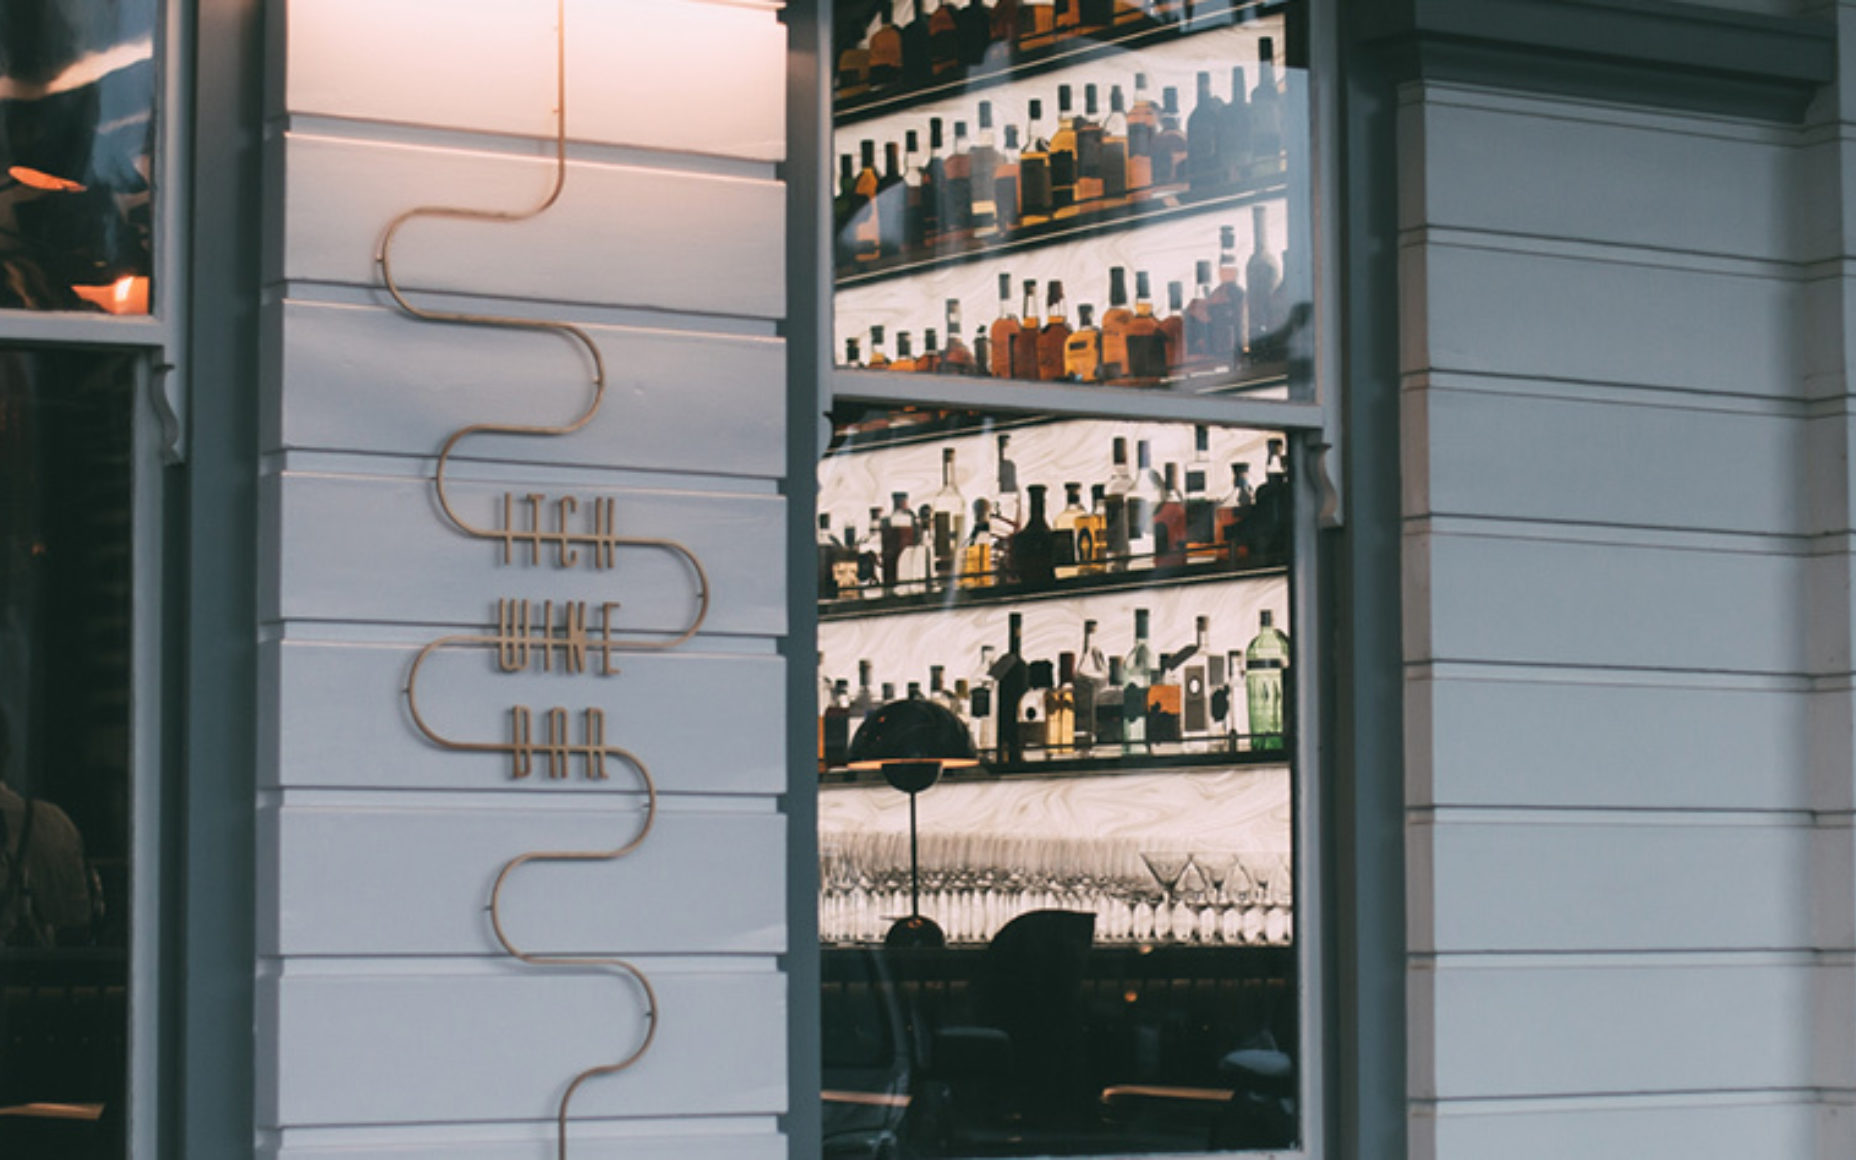 Itch Wine Bar